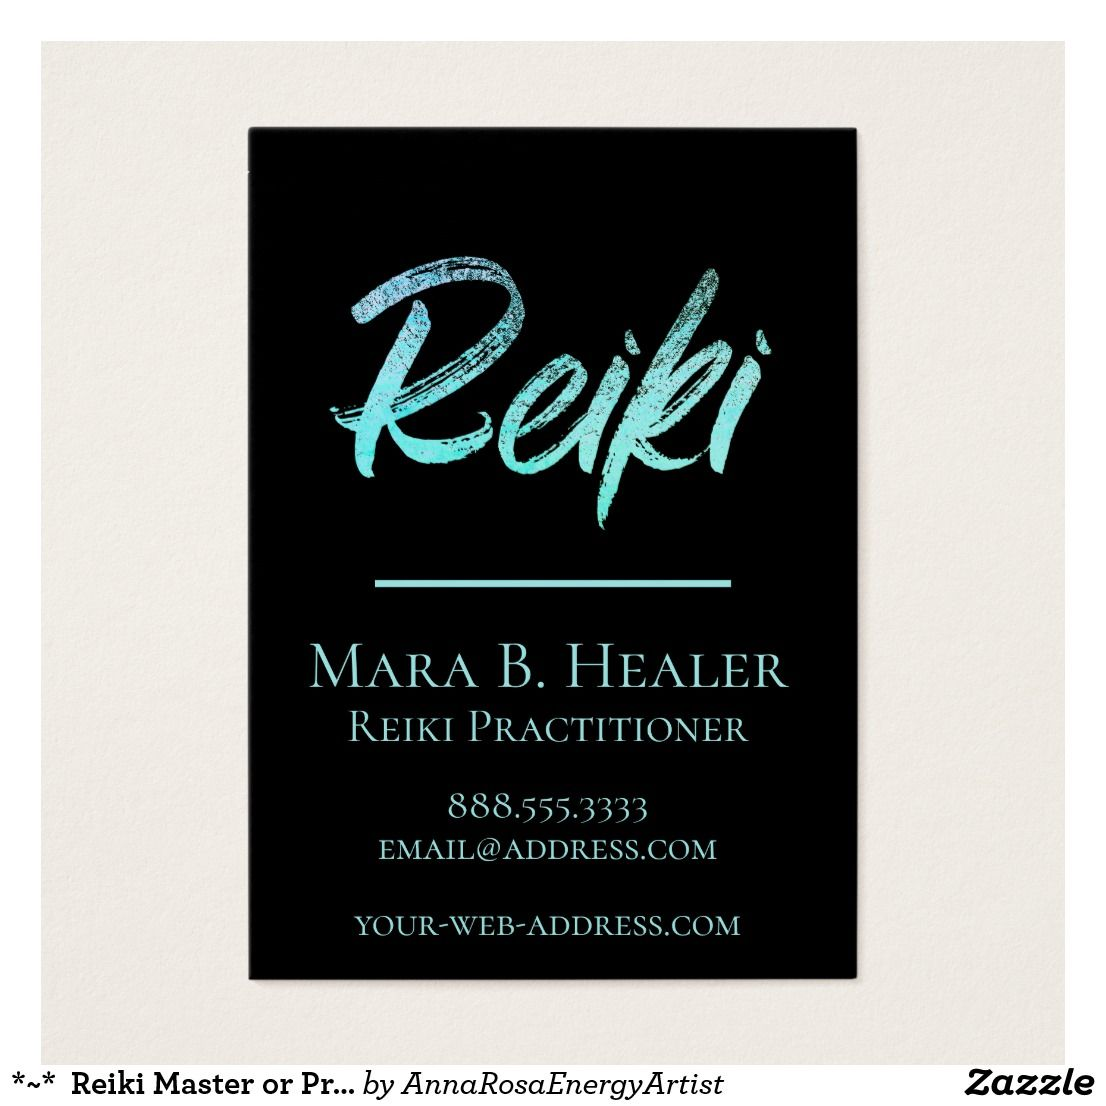 Reiki Master Or Practitioner Energy Healer Business Card Lightworker Reikimaster Annarosa Energyhealer Reiki Master Reiki Business Energy Healer